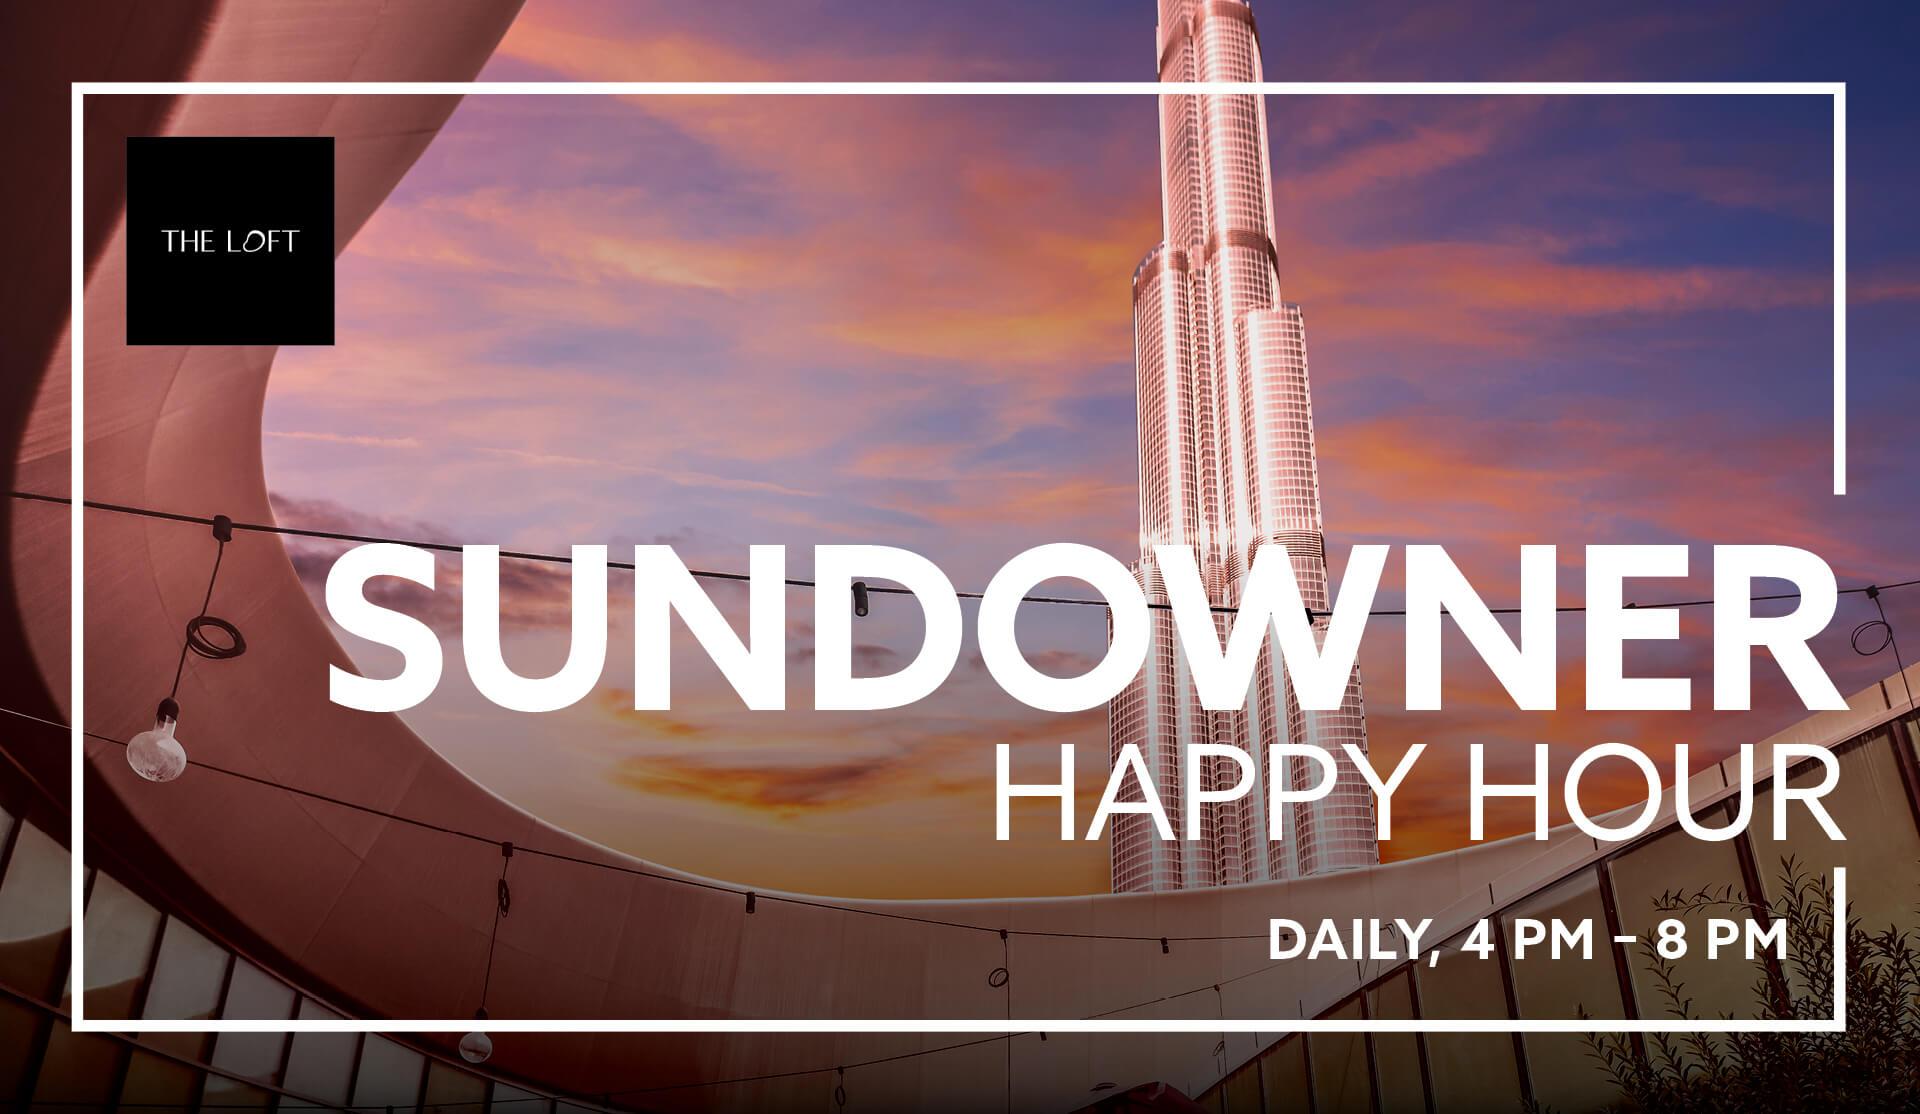 Sundowner Happy Hour